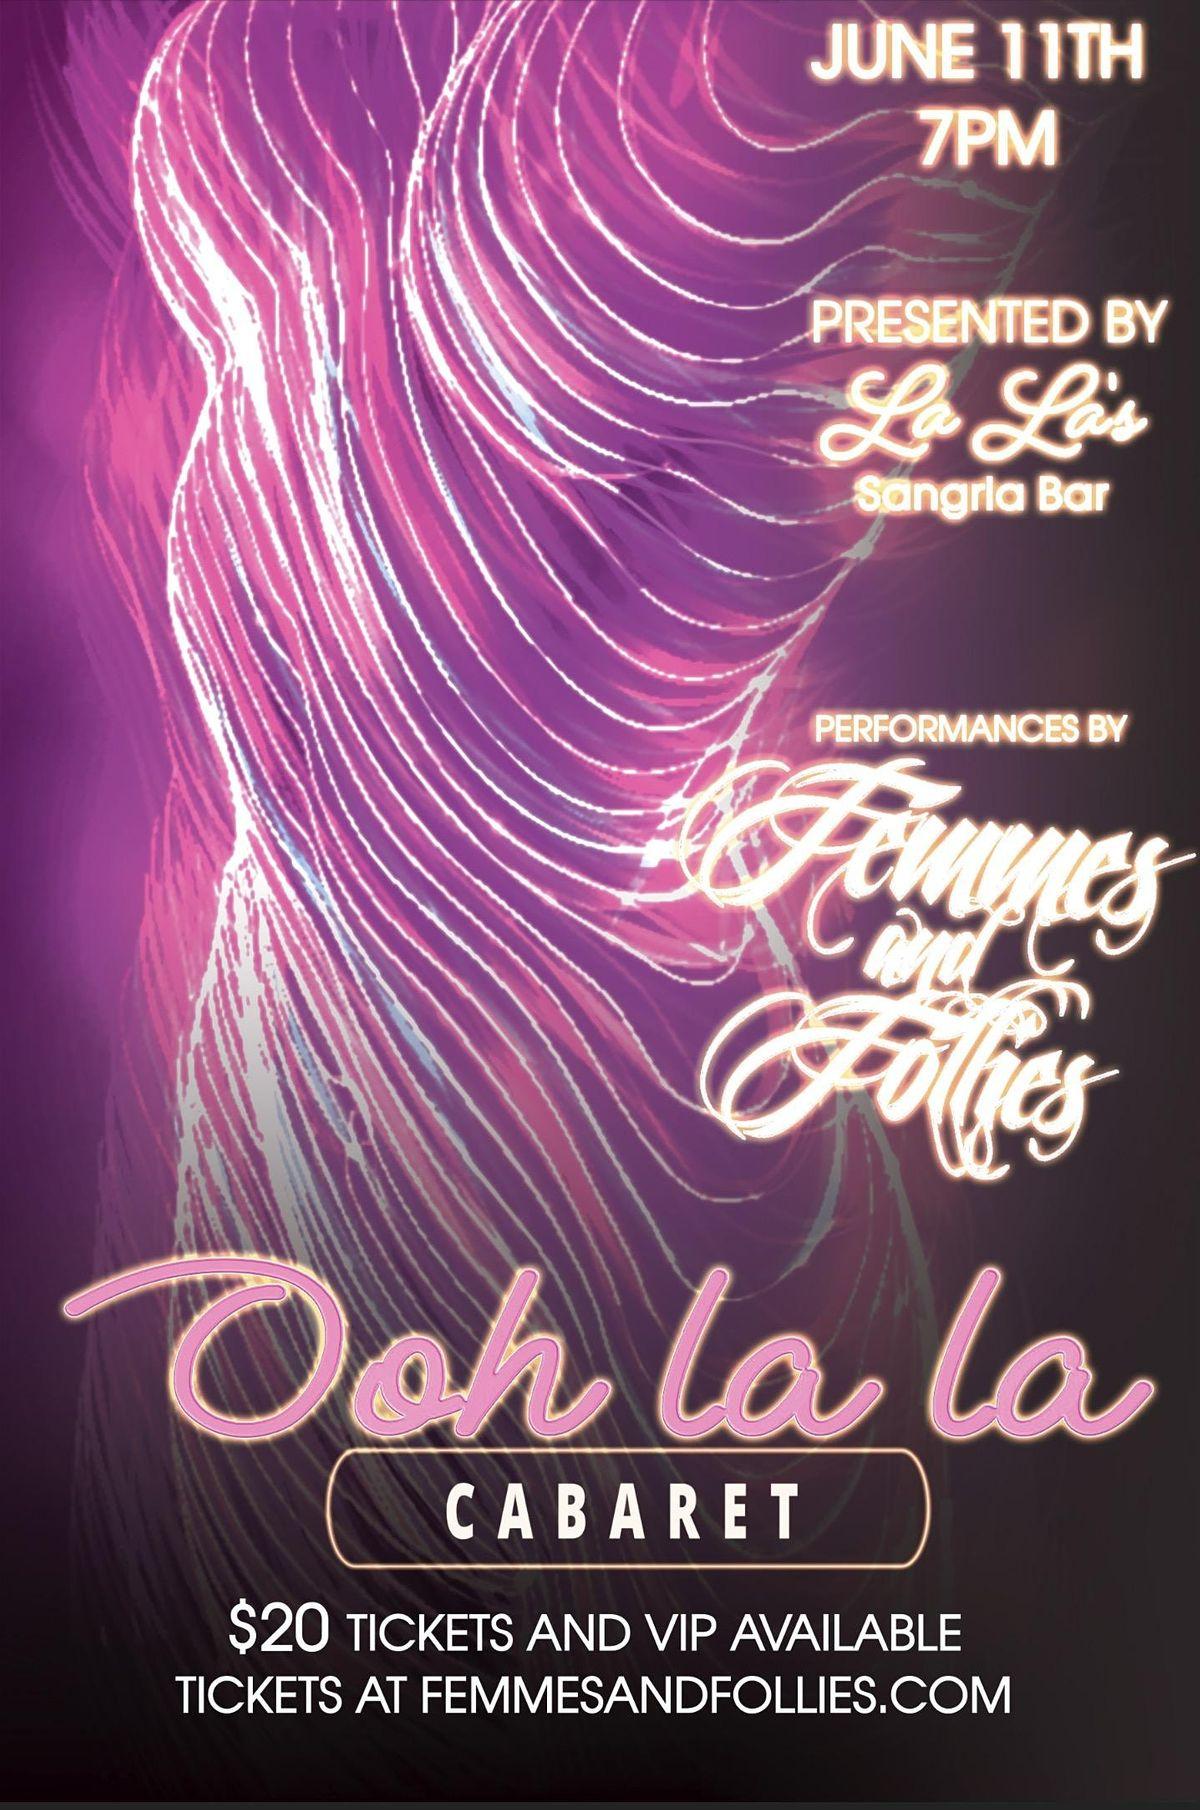 Femmes & Follies: Oh La La Cabaret!